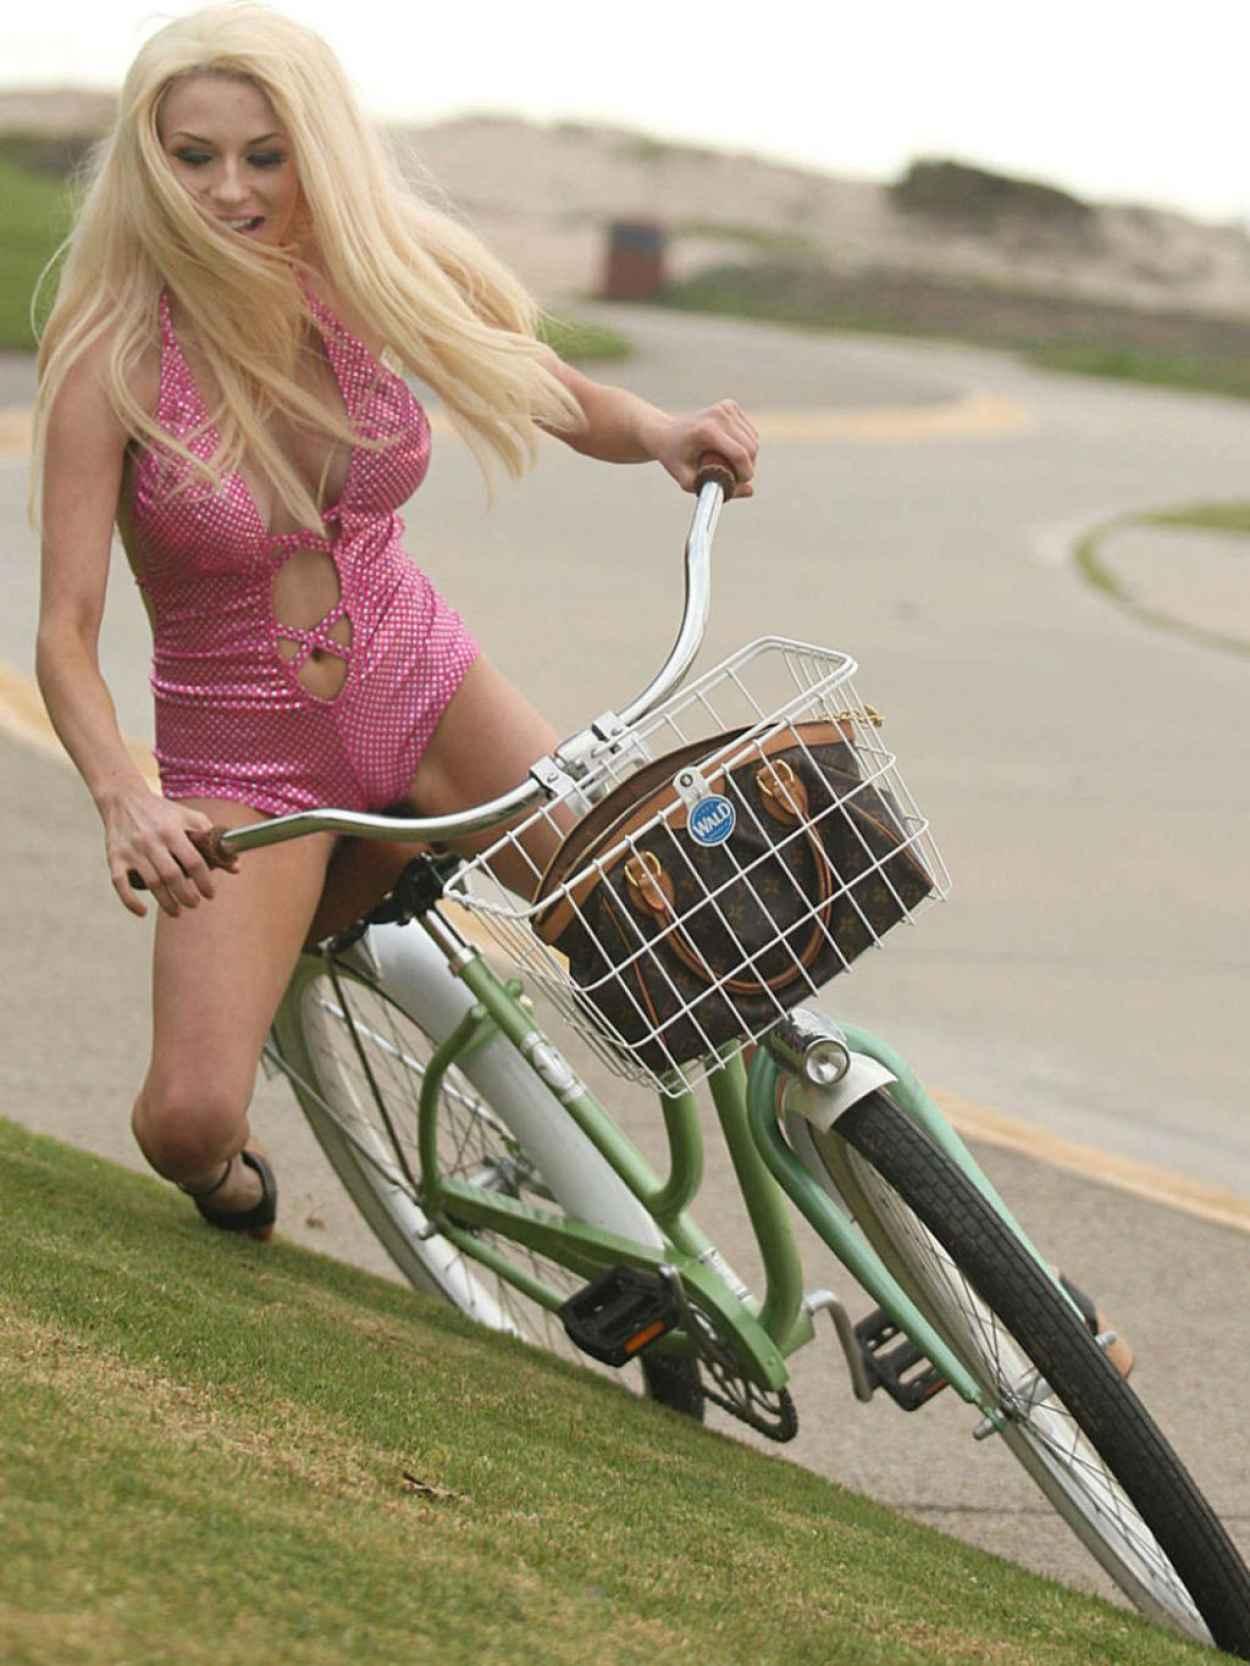 Courtney Stodden in Swimsuit - Falls off Her Bike-1